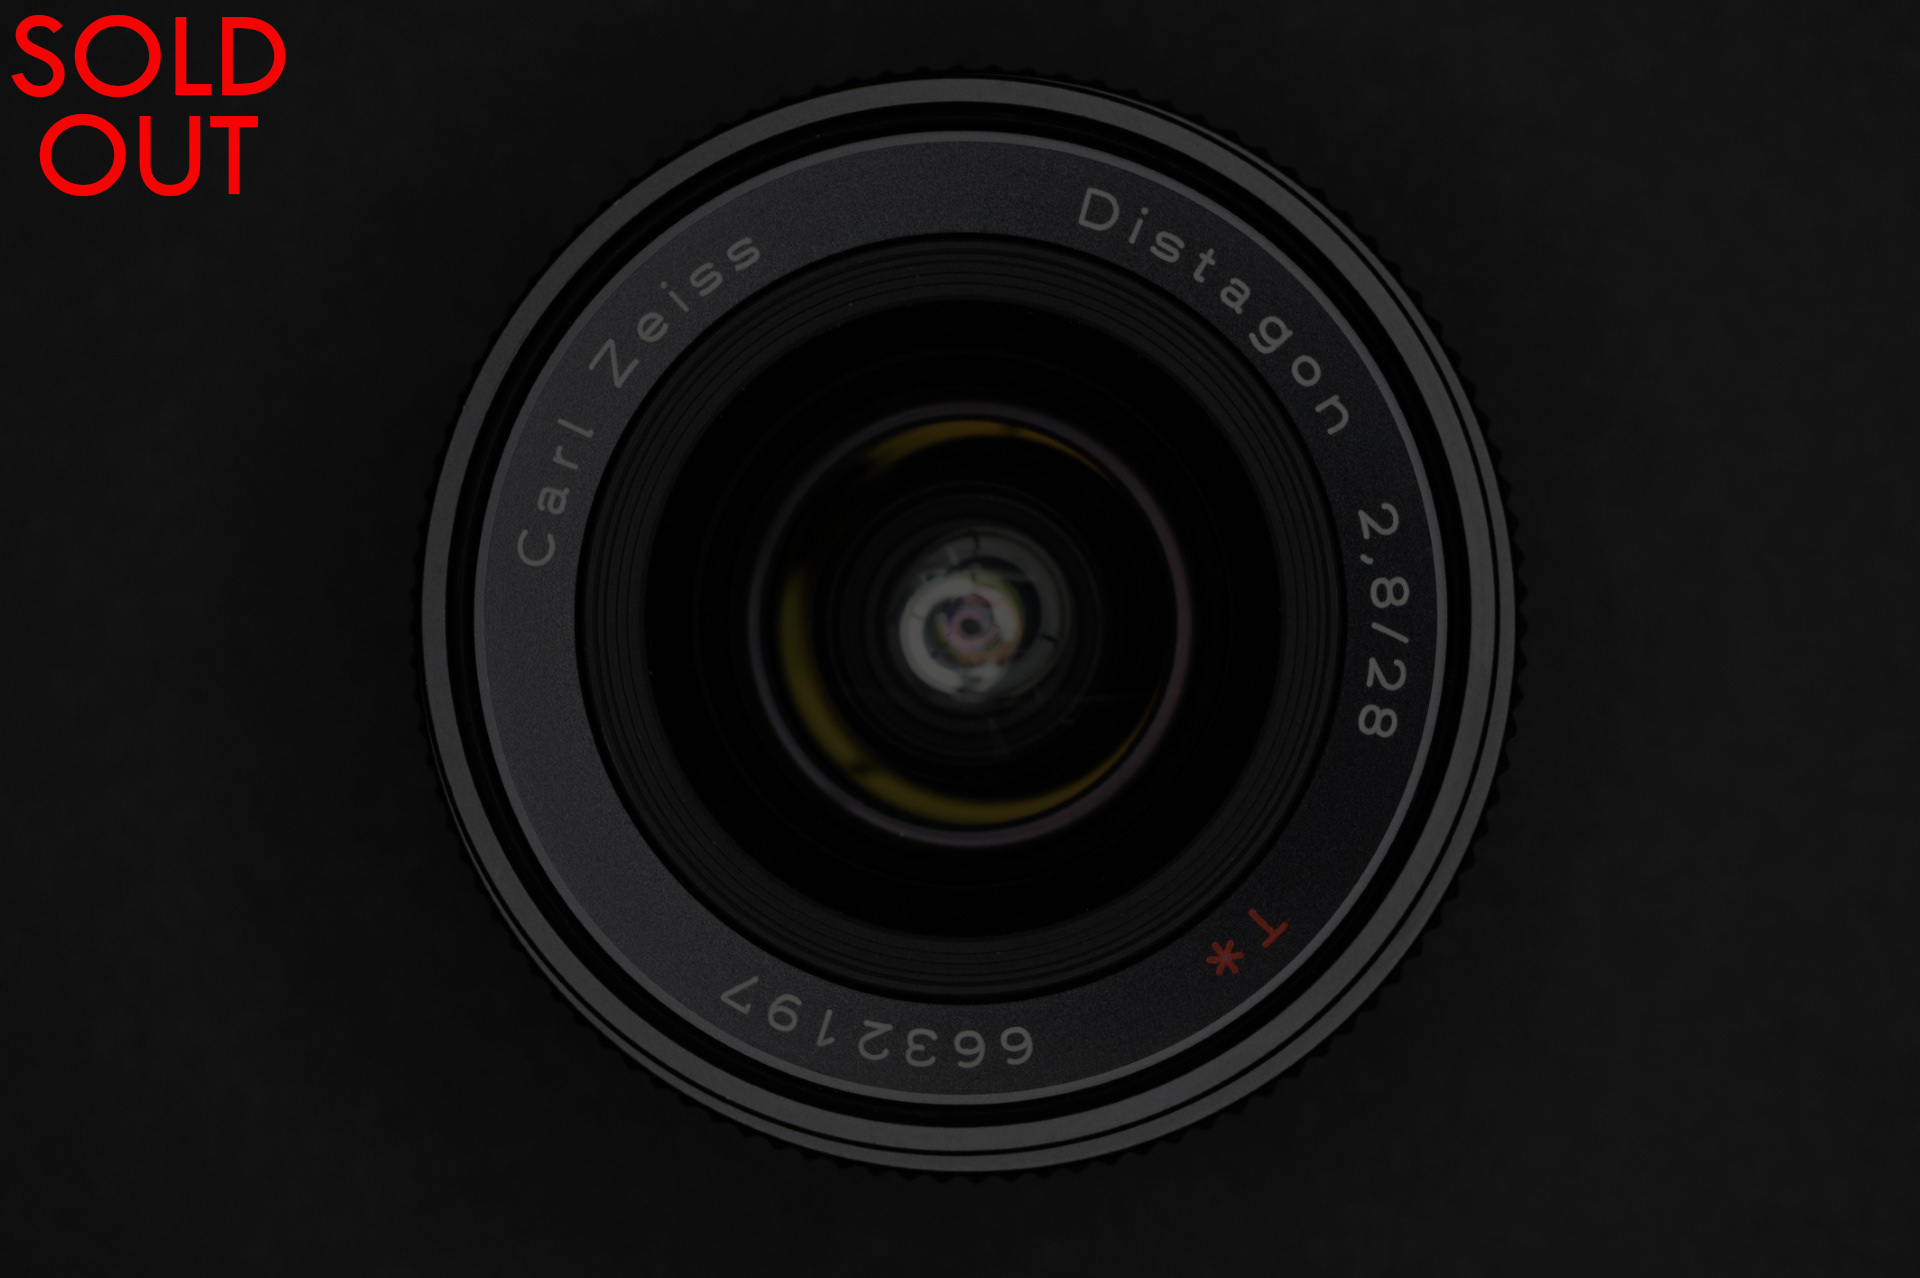 Zeiss Distagon 28mm f2 8 T*   [mint]   FotoStrobo Camera Shop